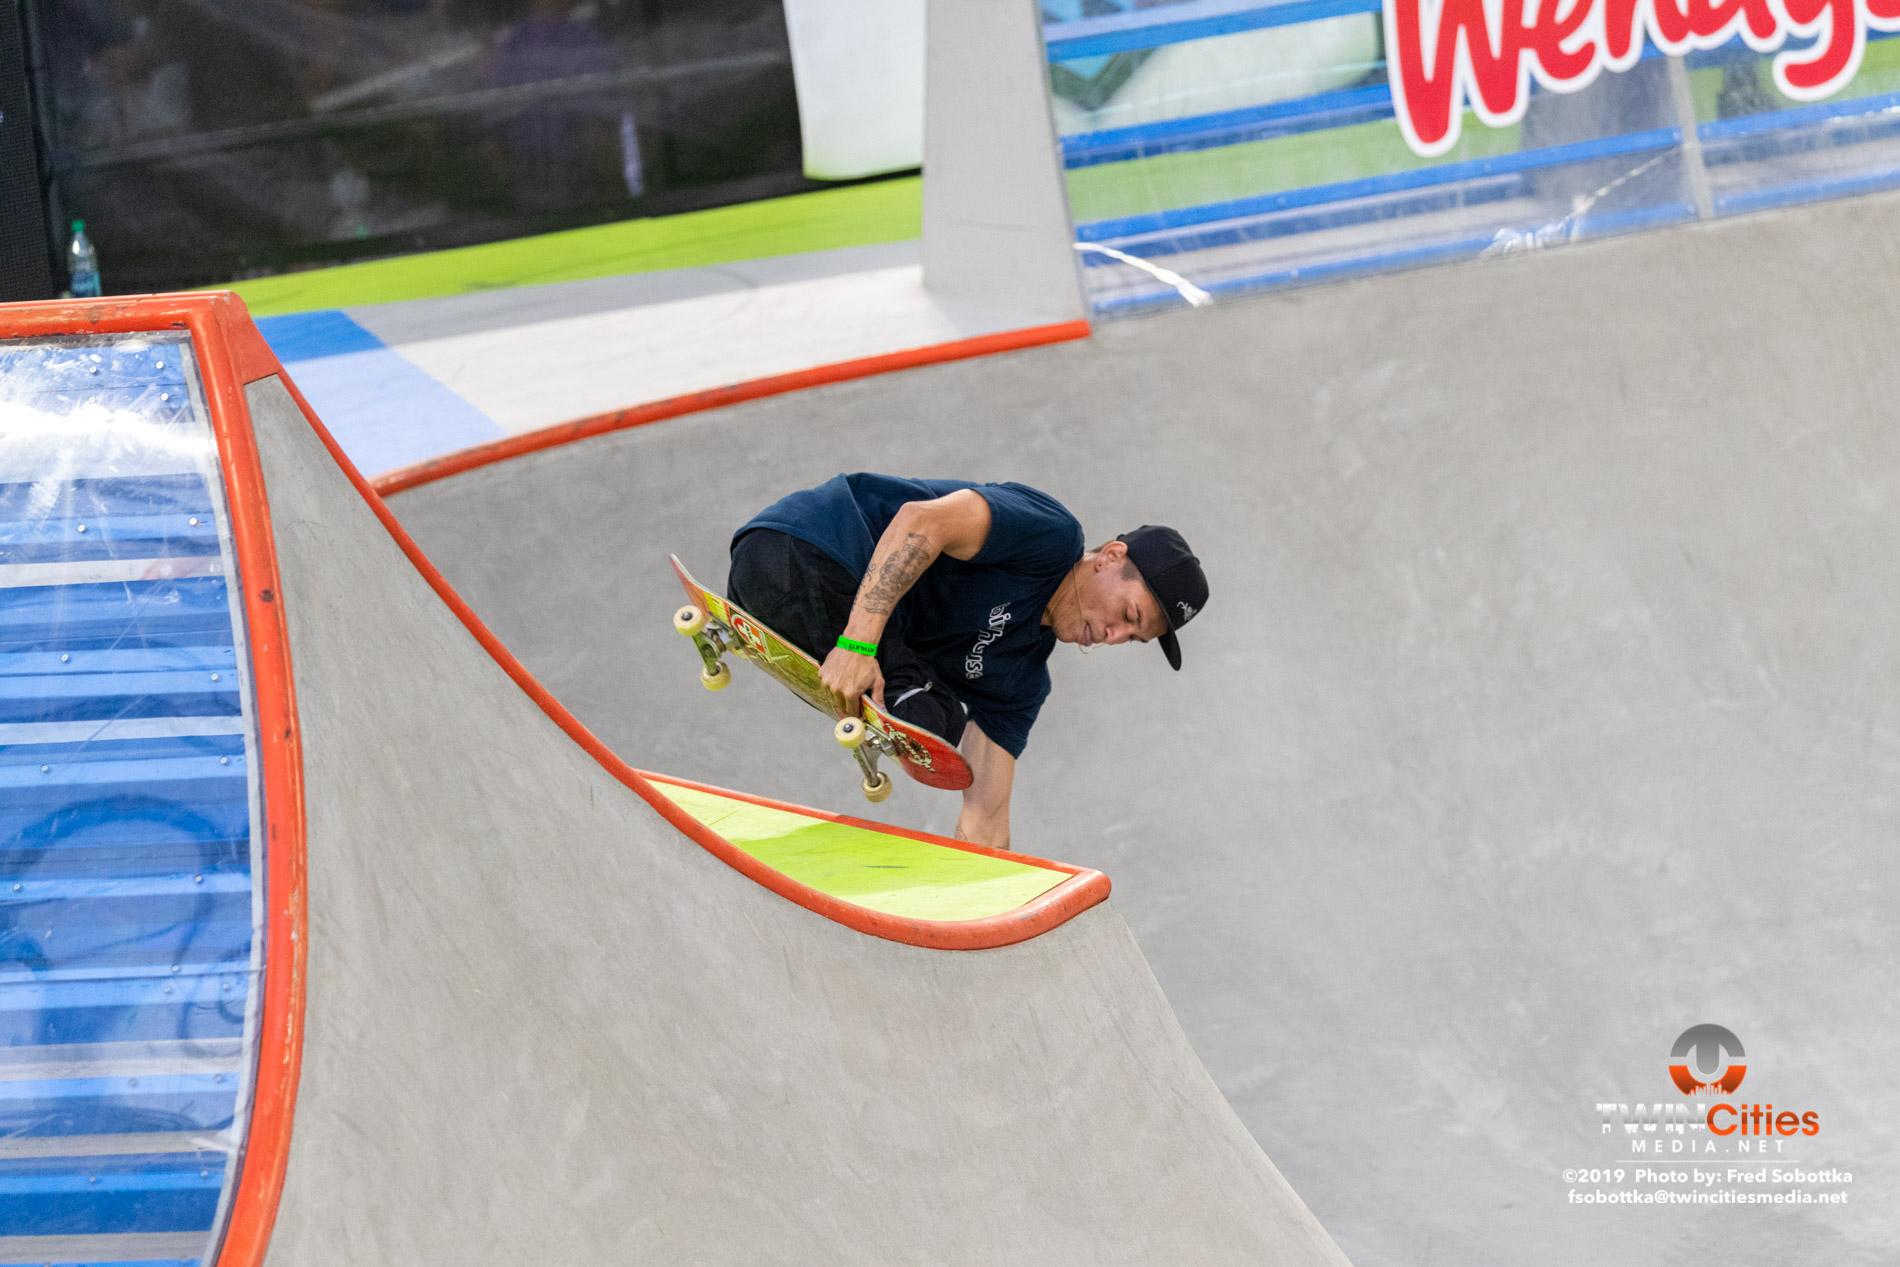 Adaptive-Skateboard-Park-12